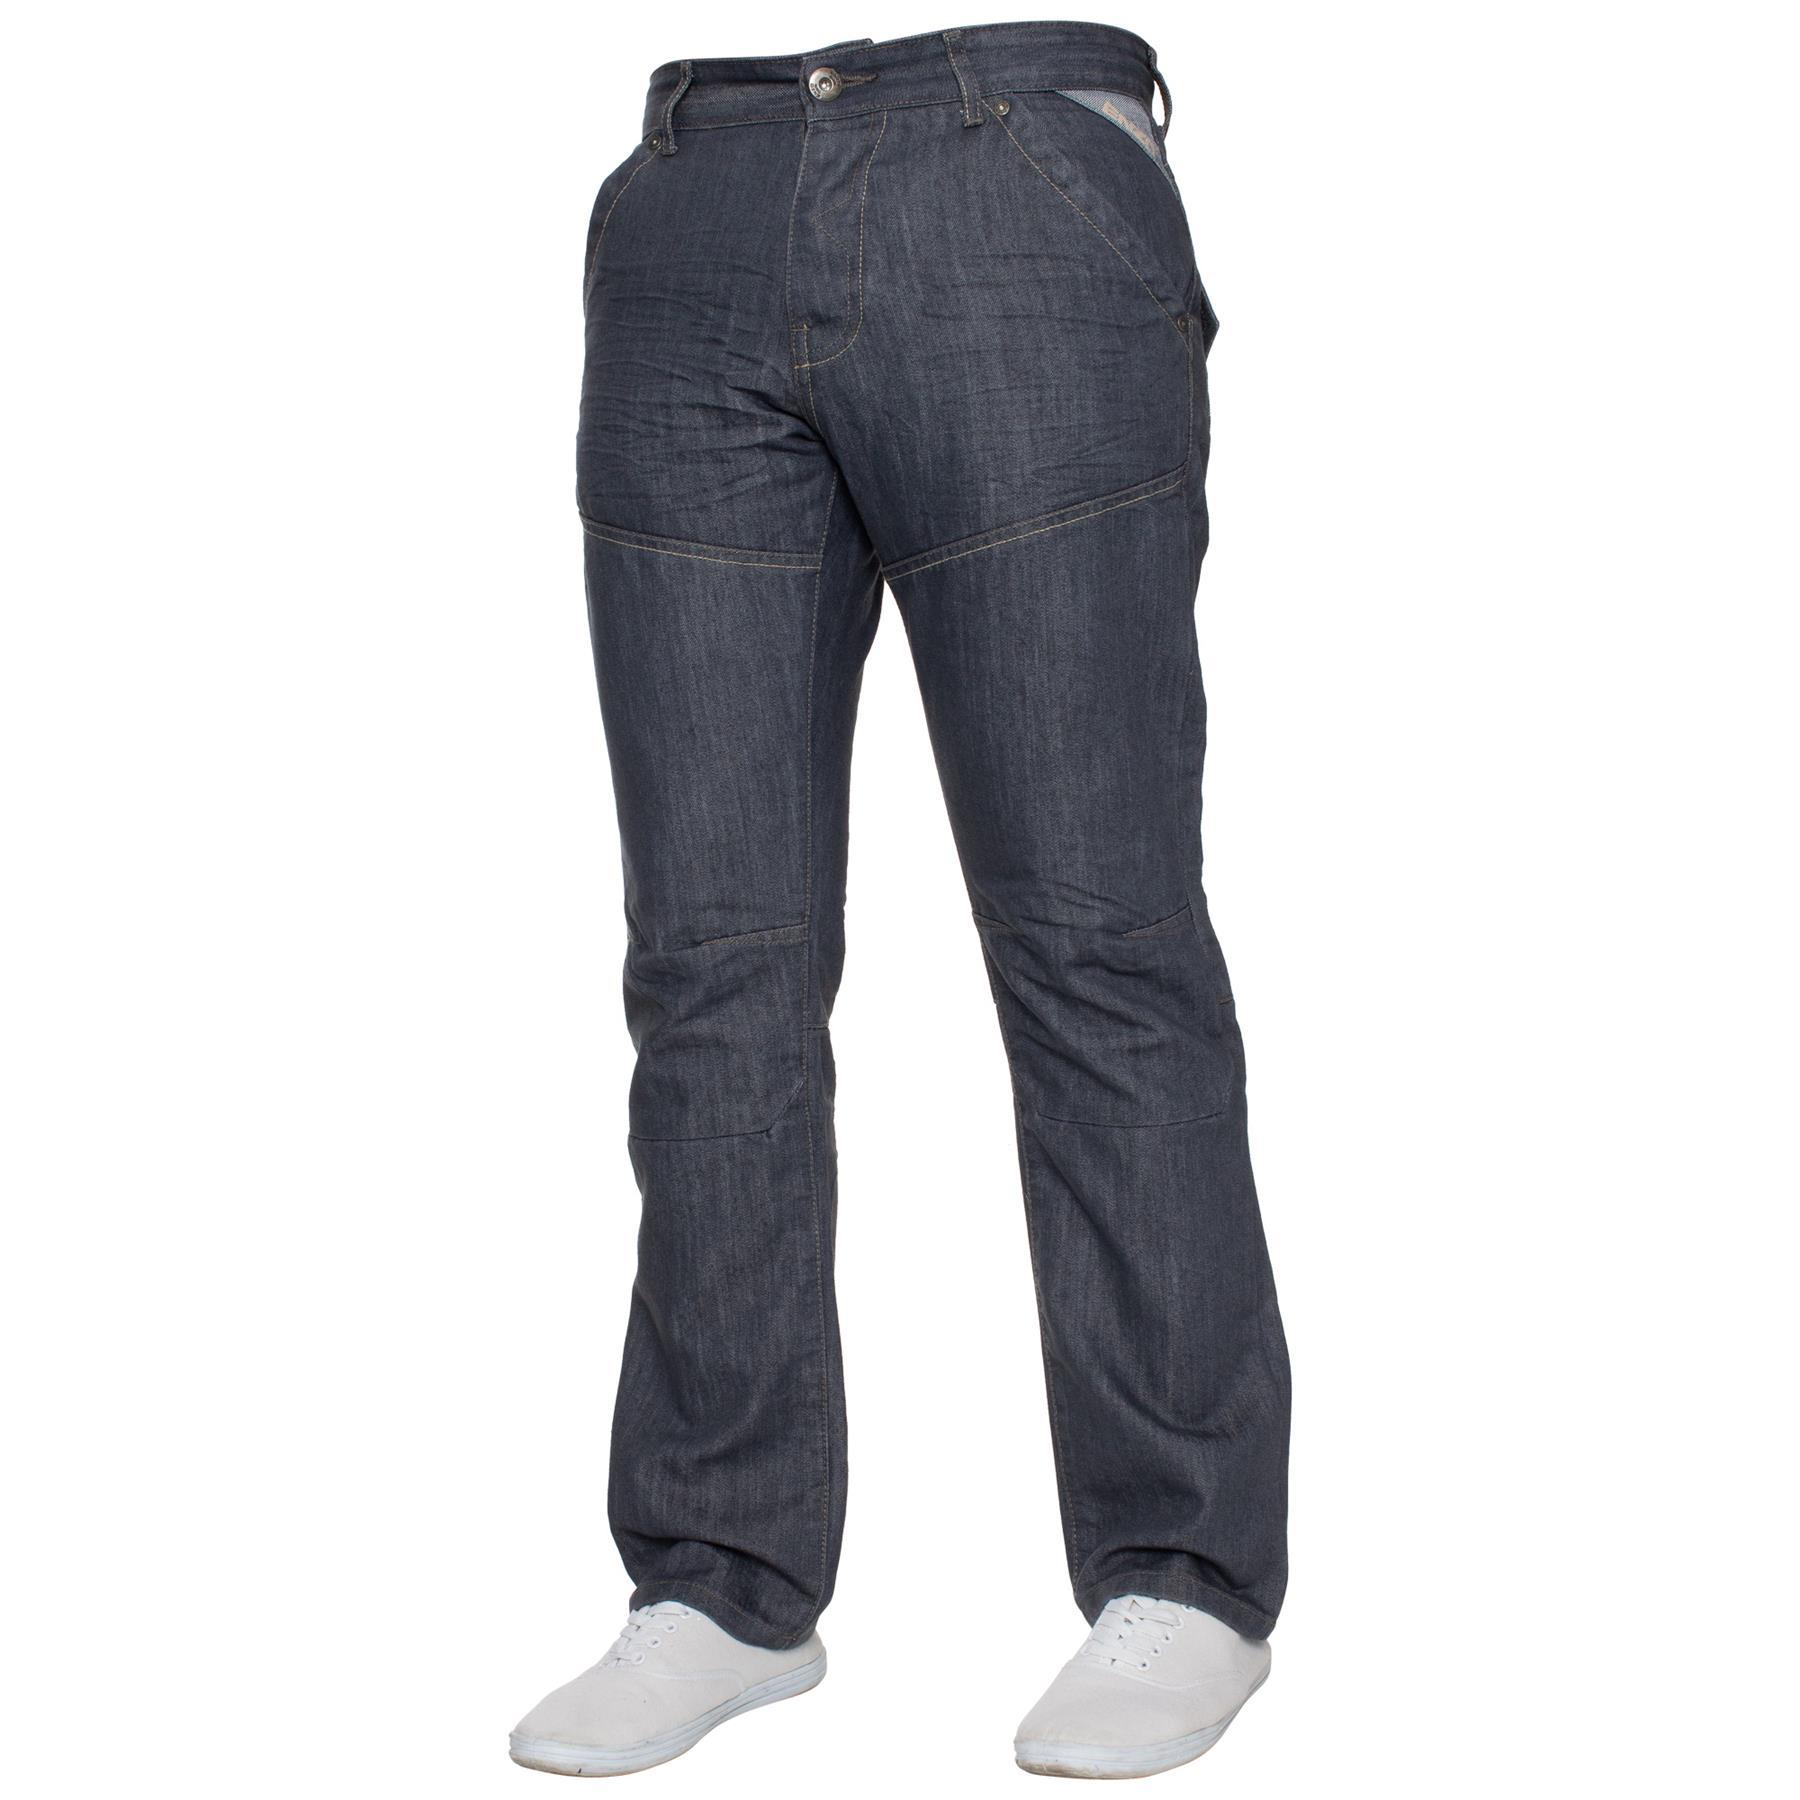 Enzo-Mens-Big-Tall-Jeans-Leg-King-Size-Denim-Pants-Chino-Trousers-Pants-44-034-60-034 thumbnail 76